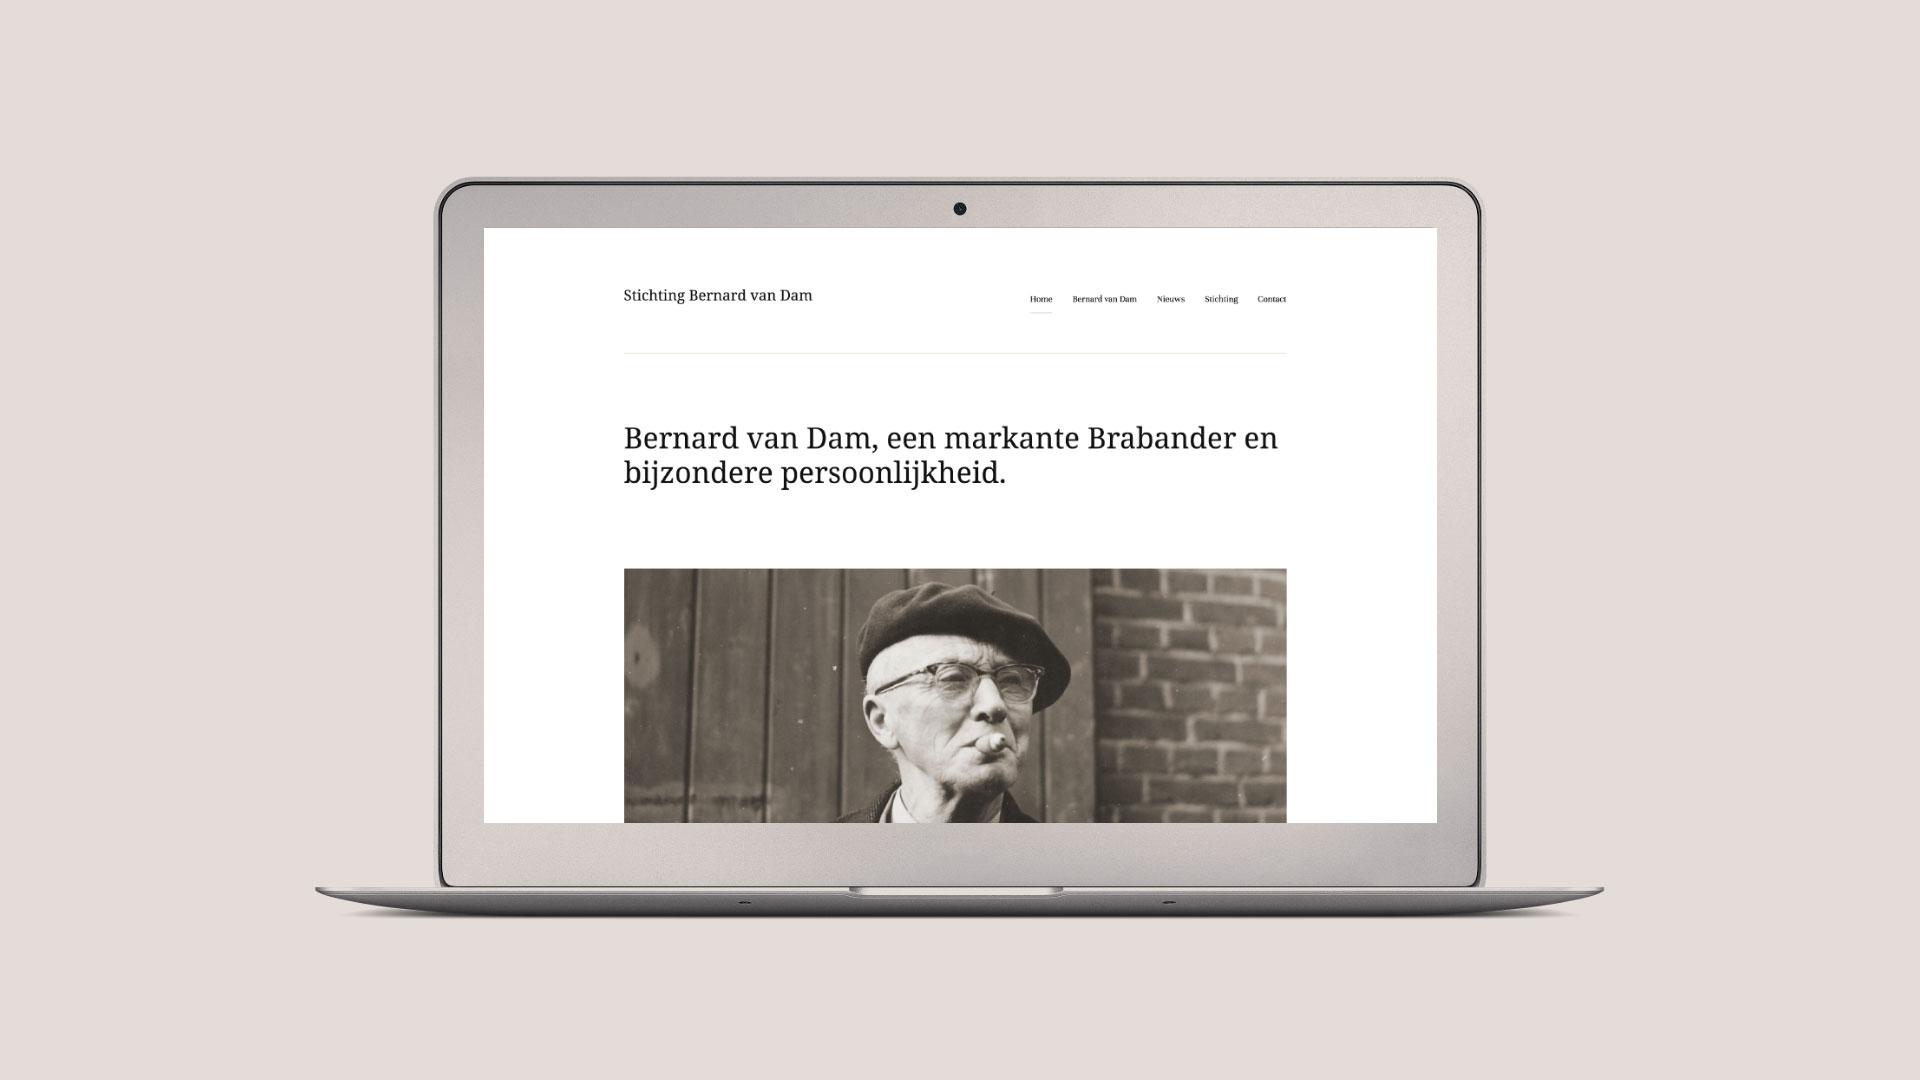 bvd_article_newwebsite_04.jpg